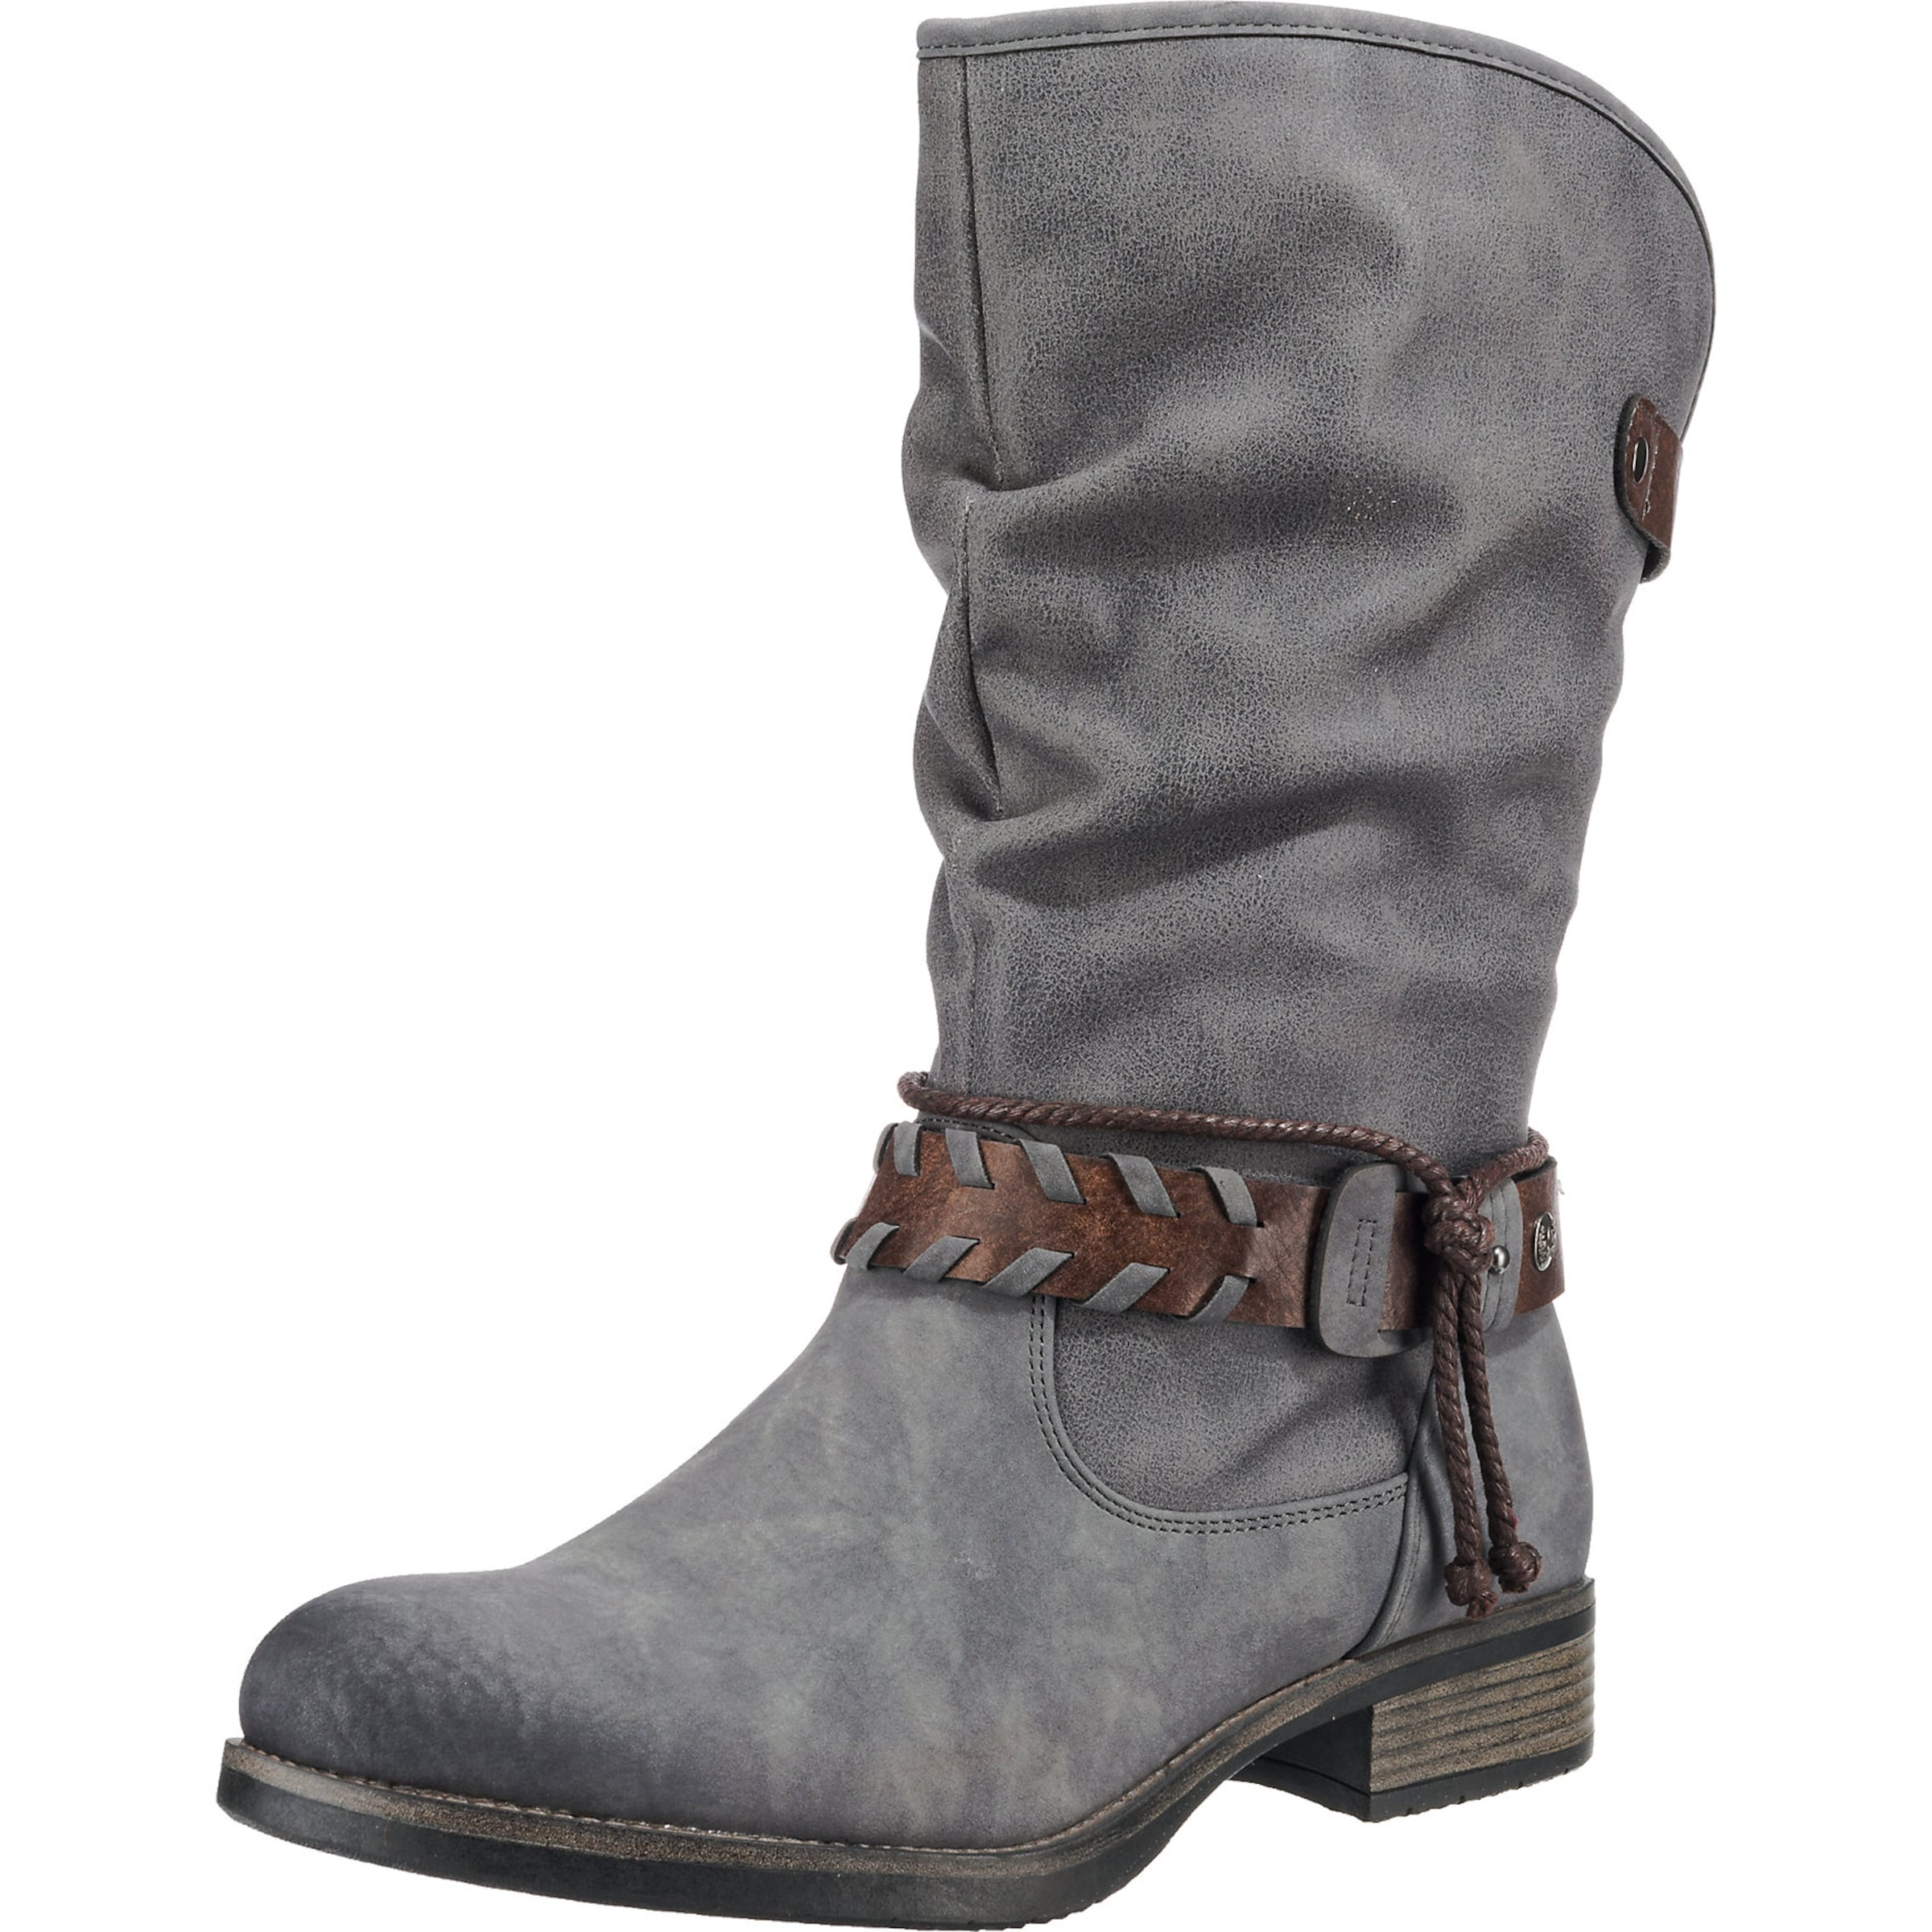 RIEKER Stiefel in braun   grau